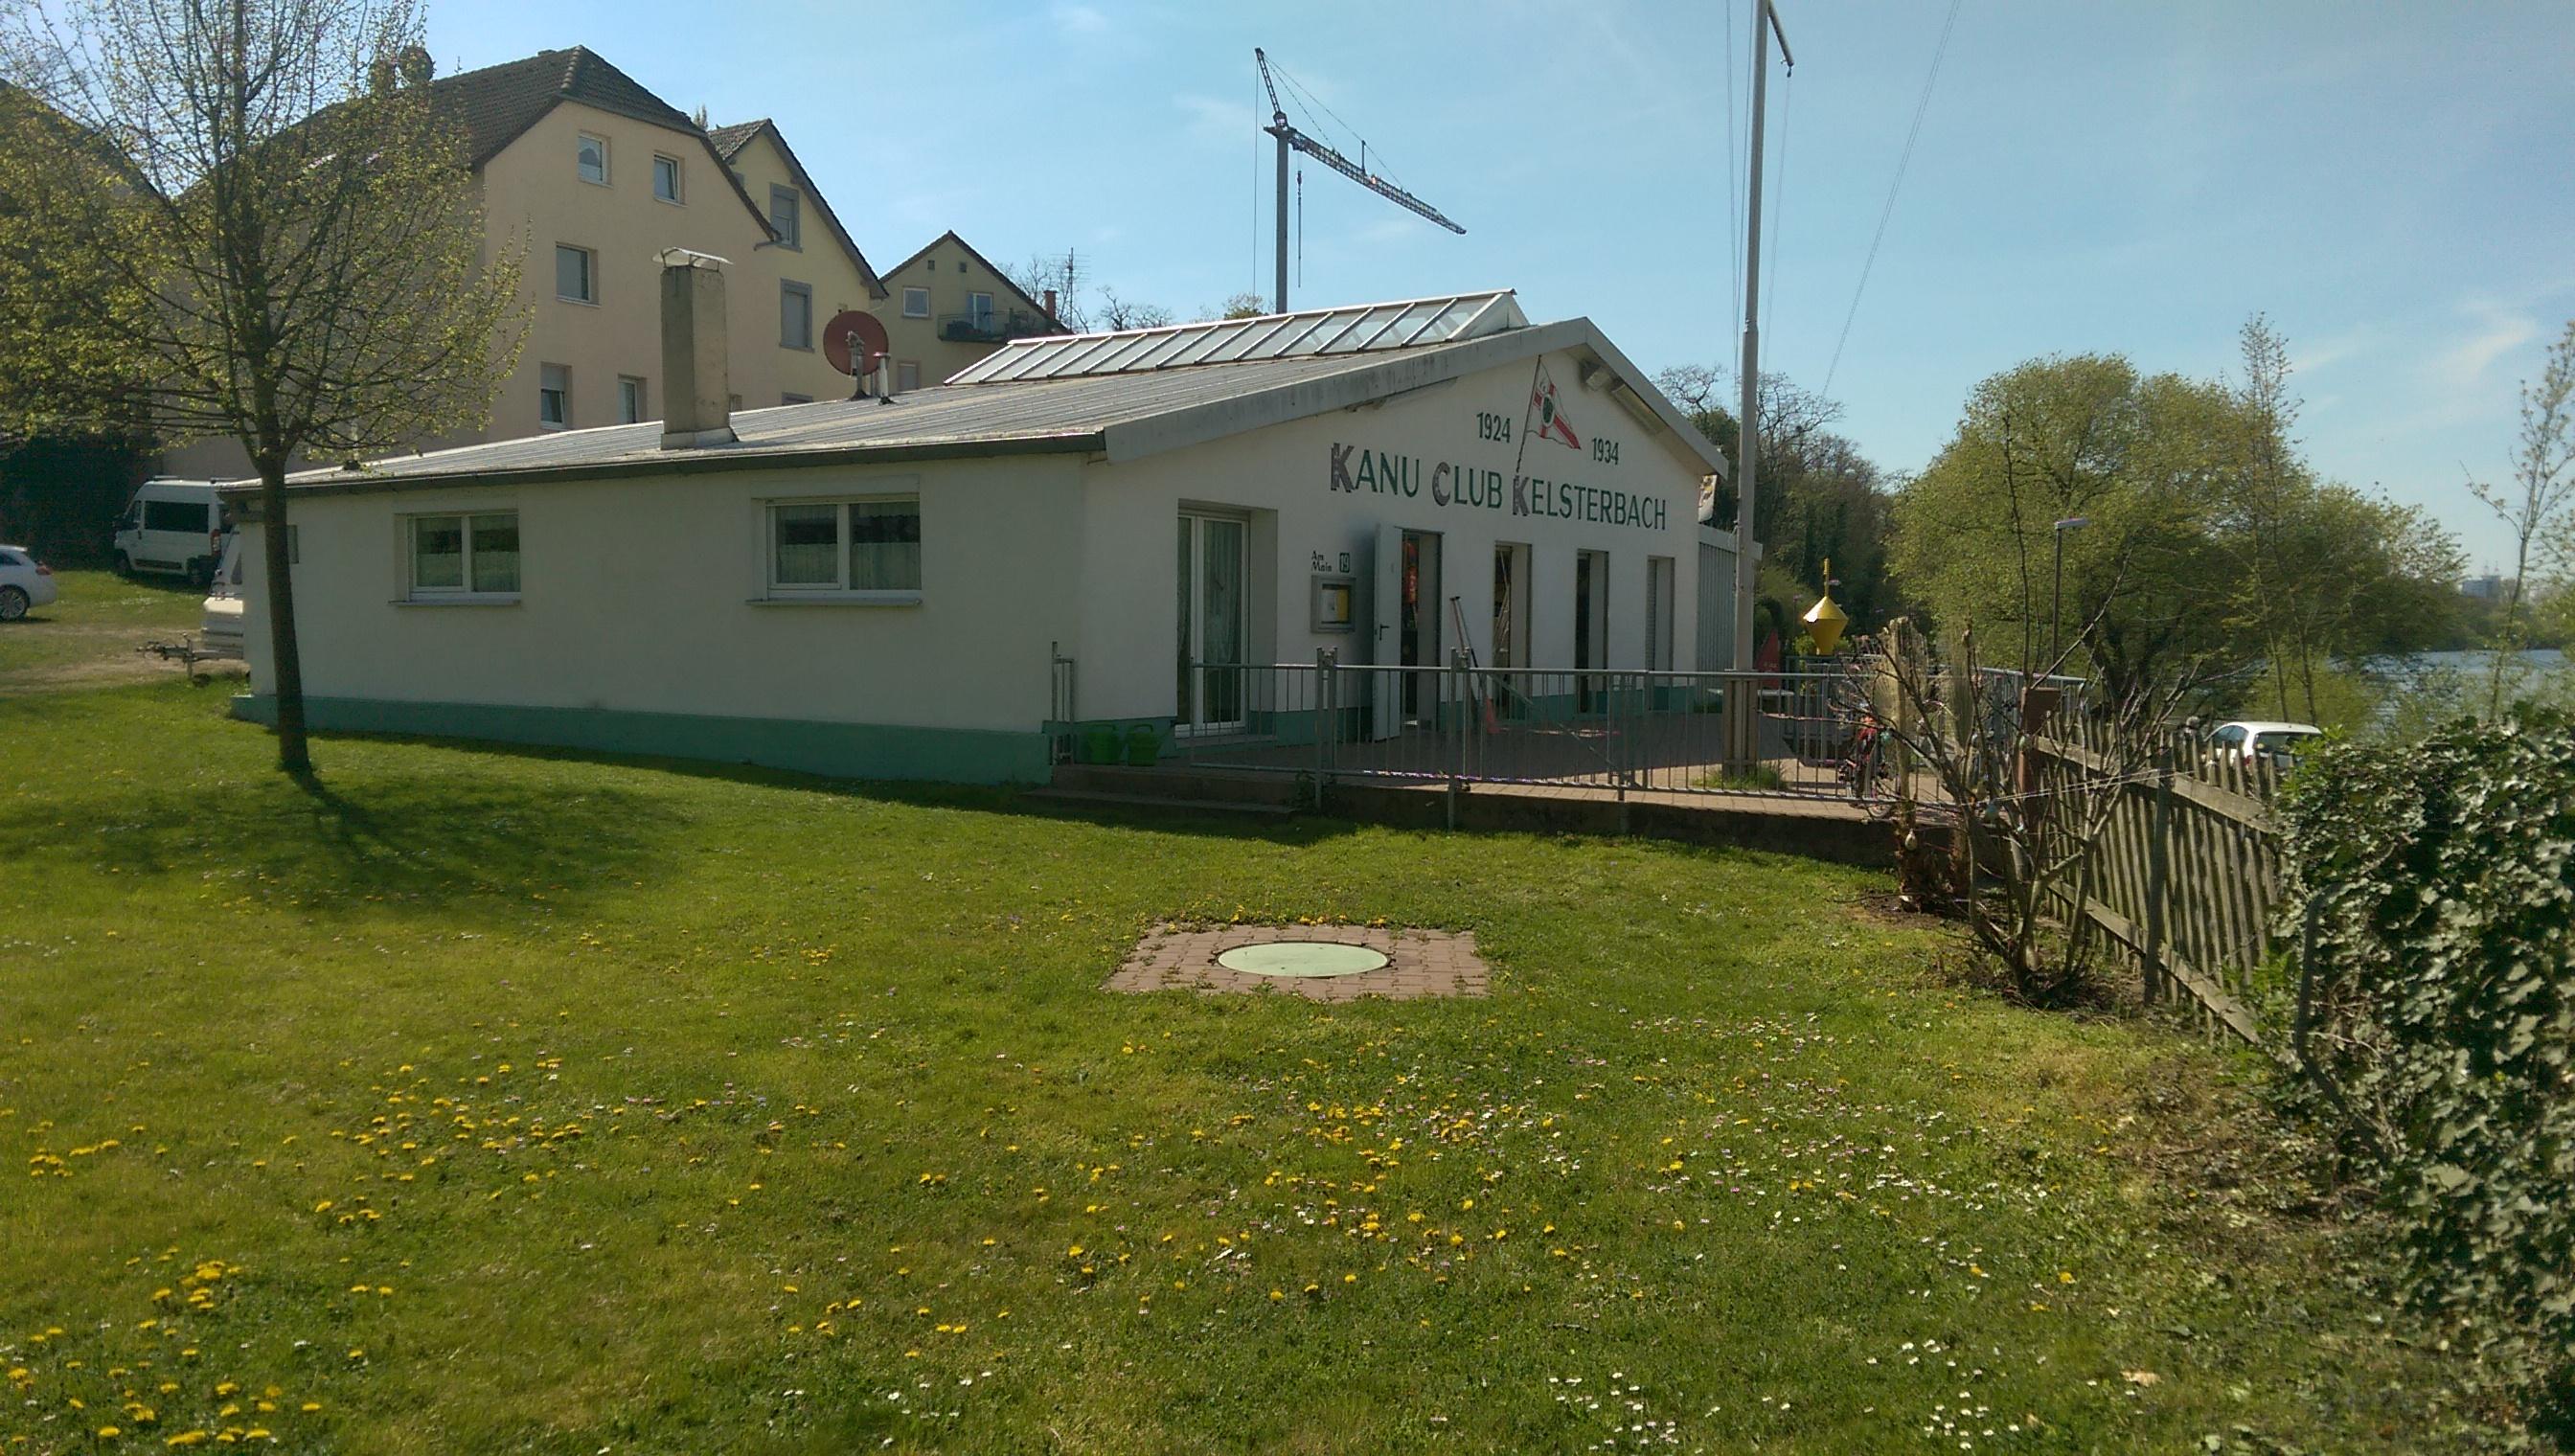 KANU-CLUB 1924 Kelsterbach